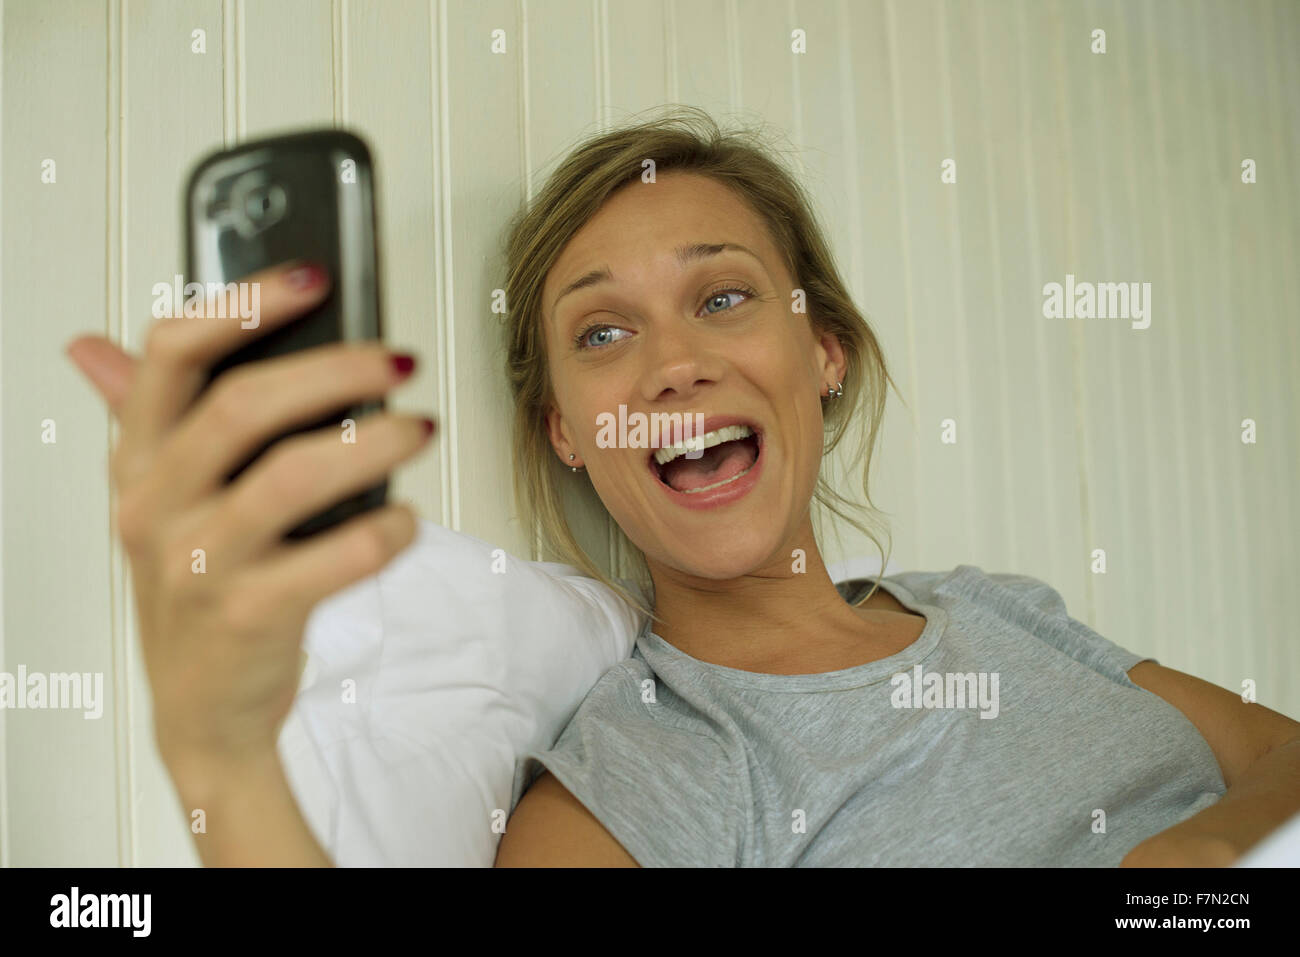 Mujer sonriente, teniendo selfie Imagen De Stock